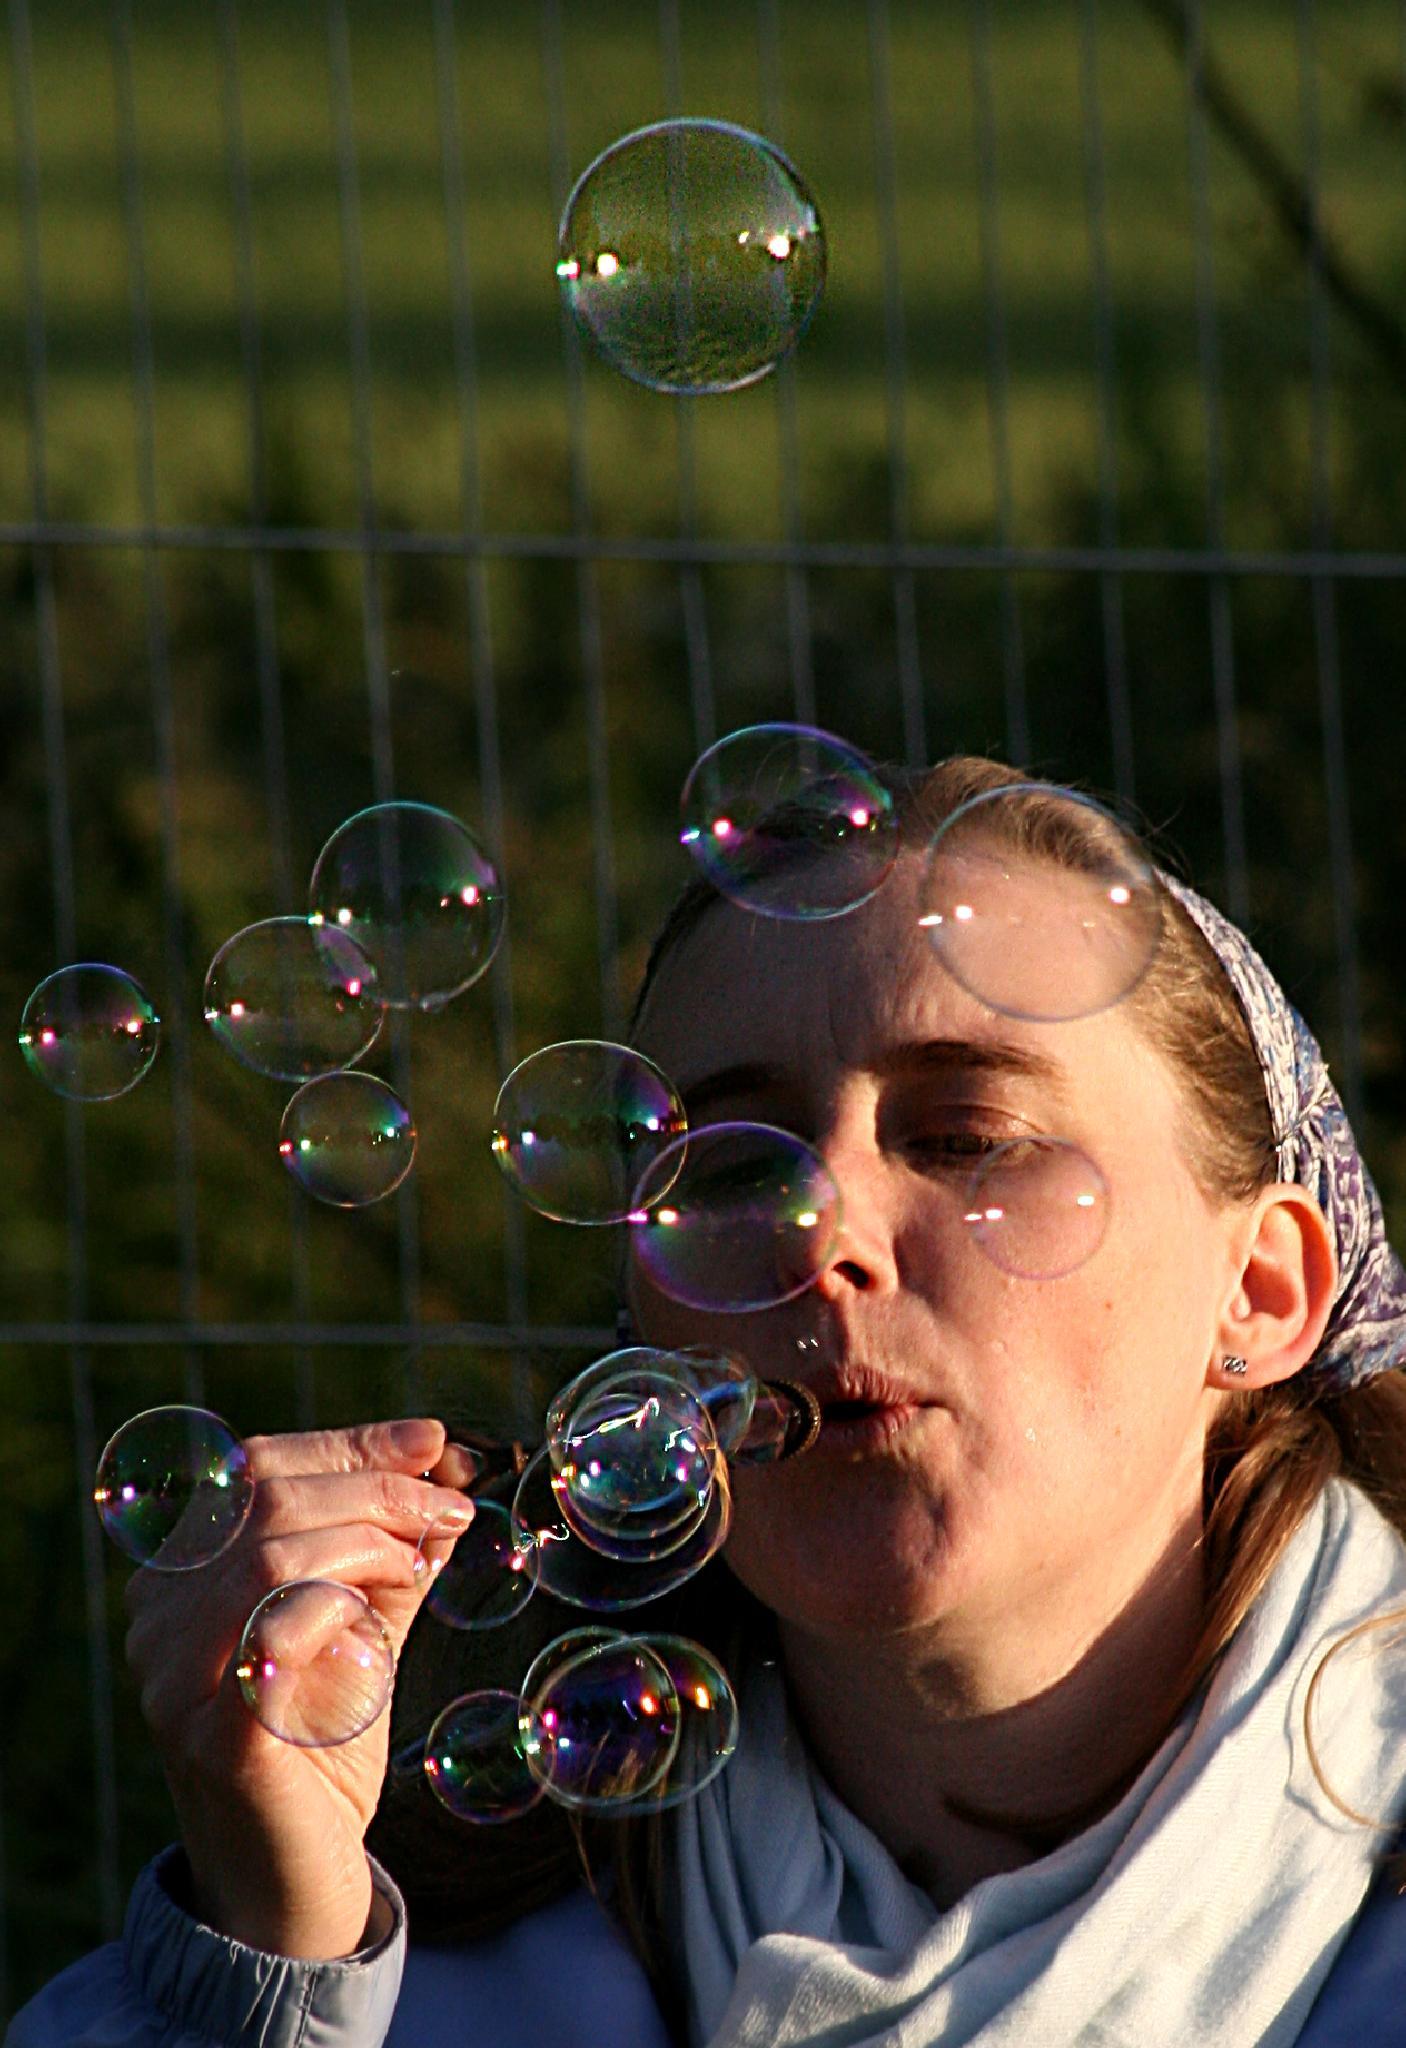 Bubbles by David R Murphy